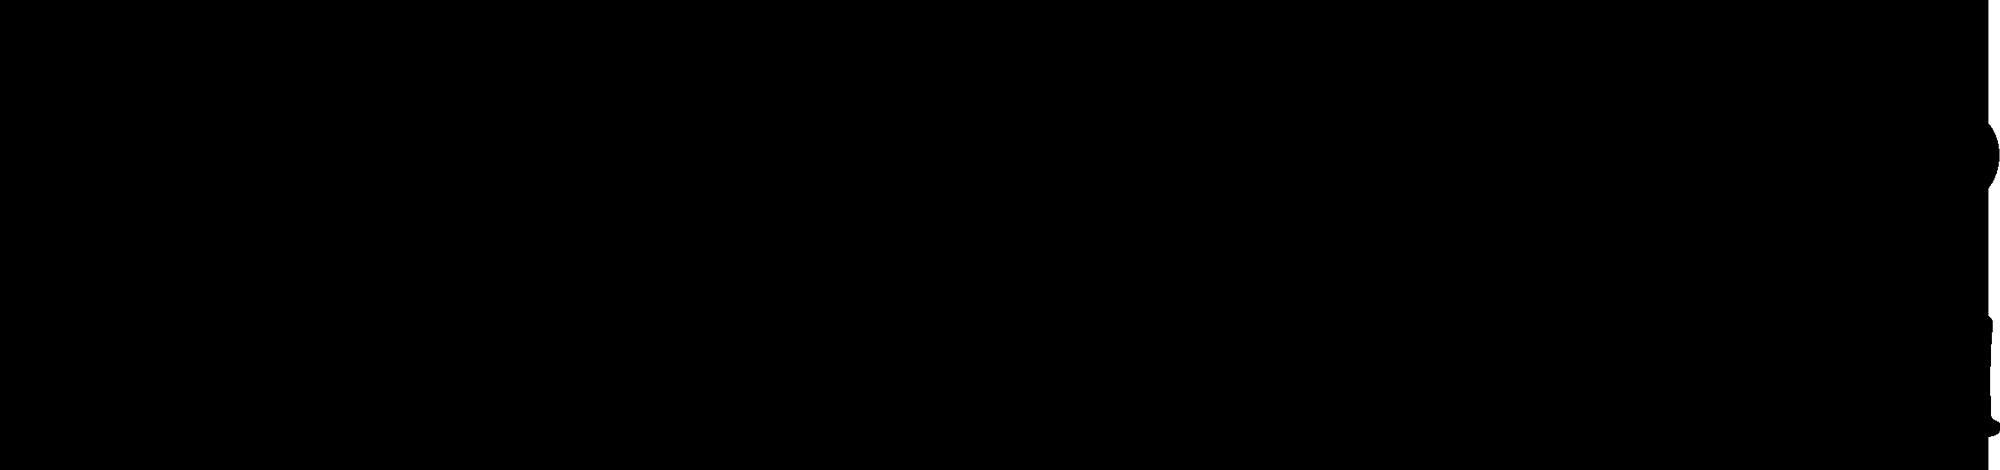 mus_logo_tekst-webopt-black.png